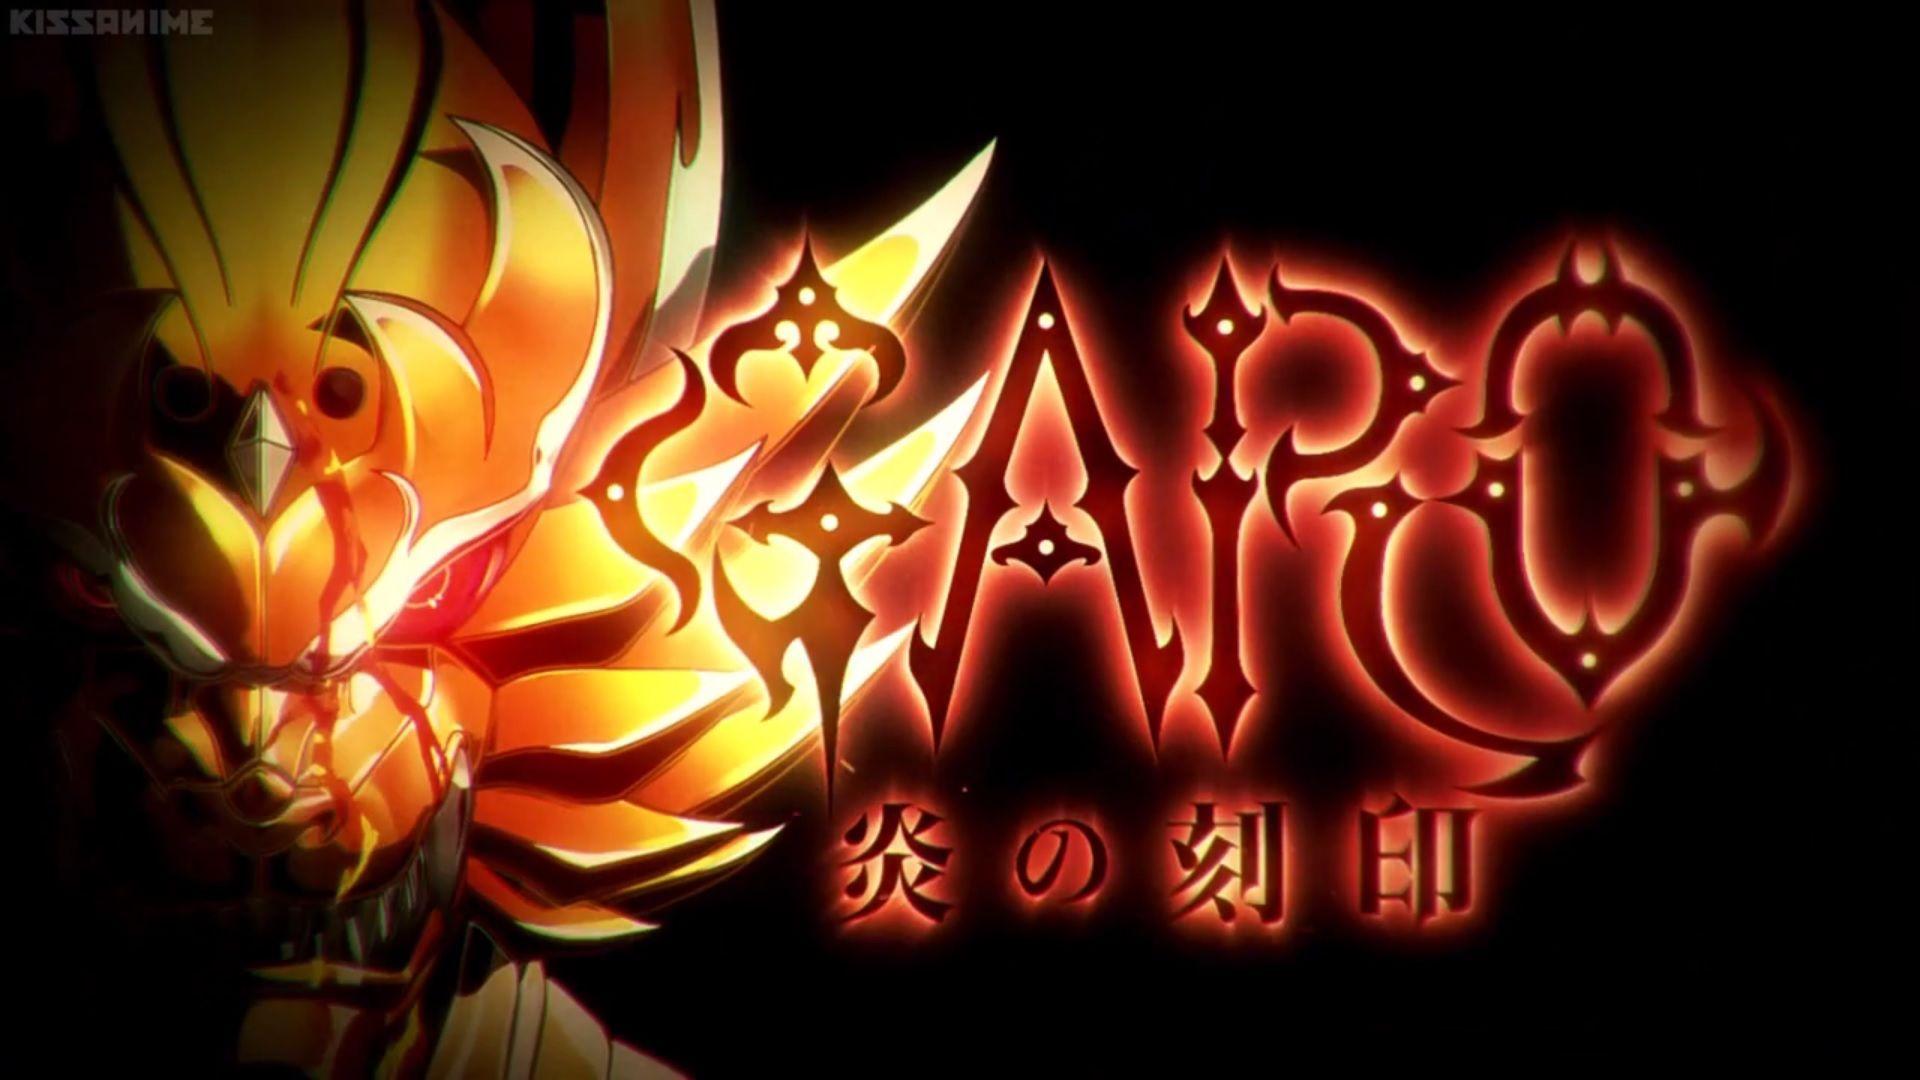 Garo Animation Wallpaper Google Search Animation Watch Manga